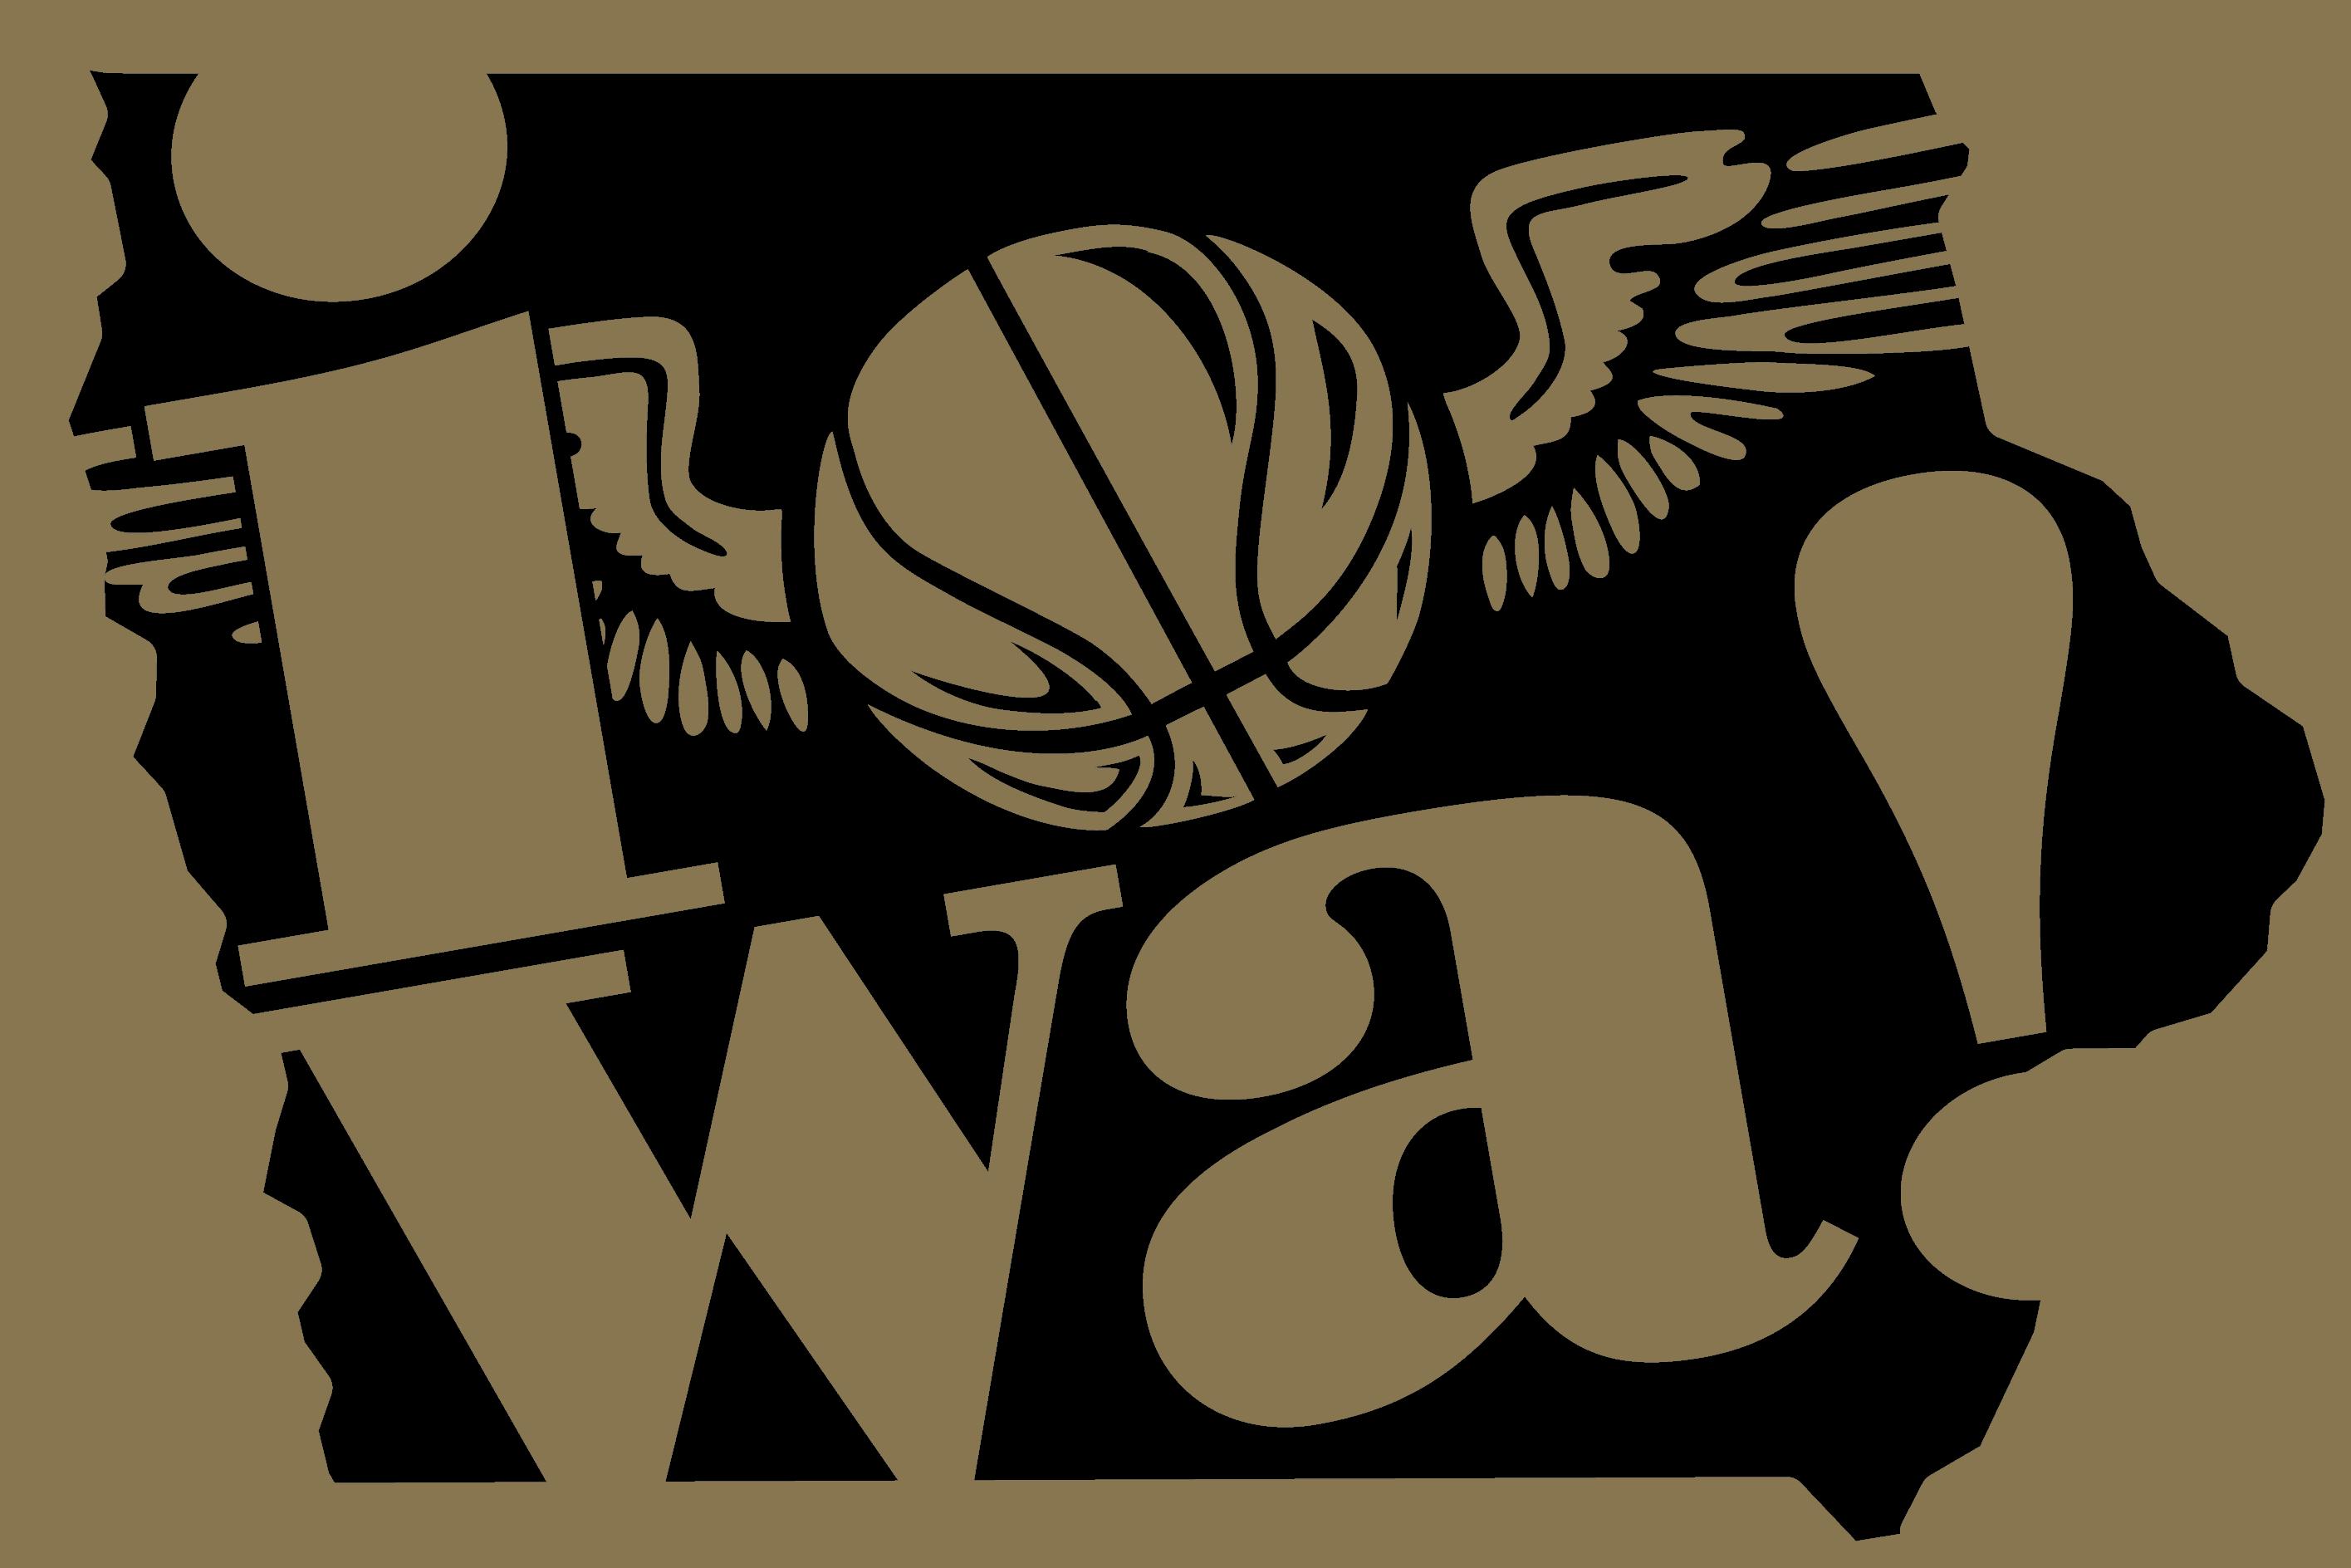 Iowa Barnstormers BasketballIowa Barnstormers Basketball logo